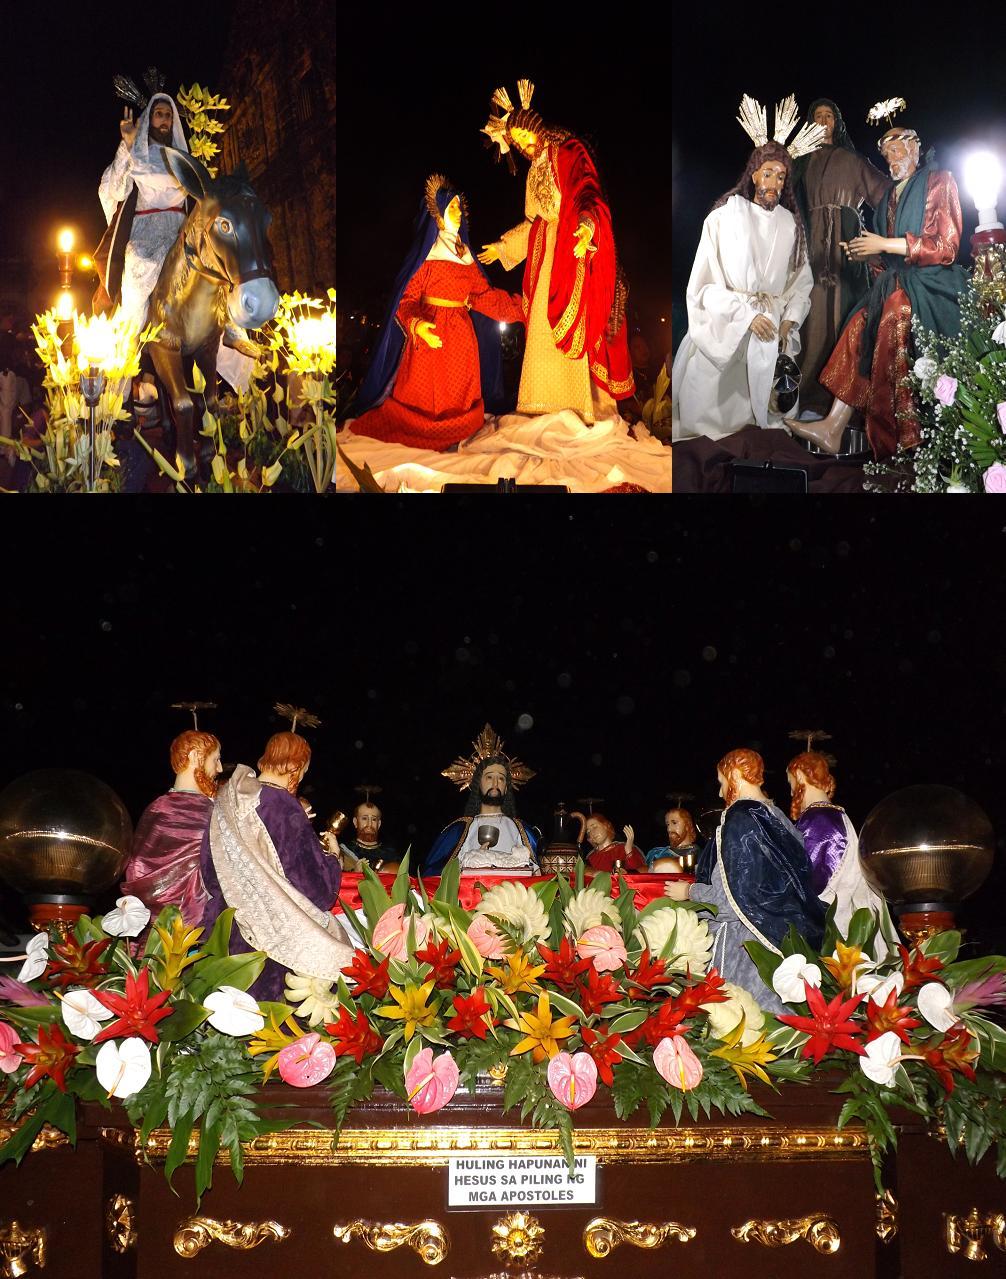 pulchra es et decora filia jerusalem